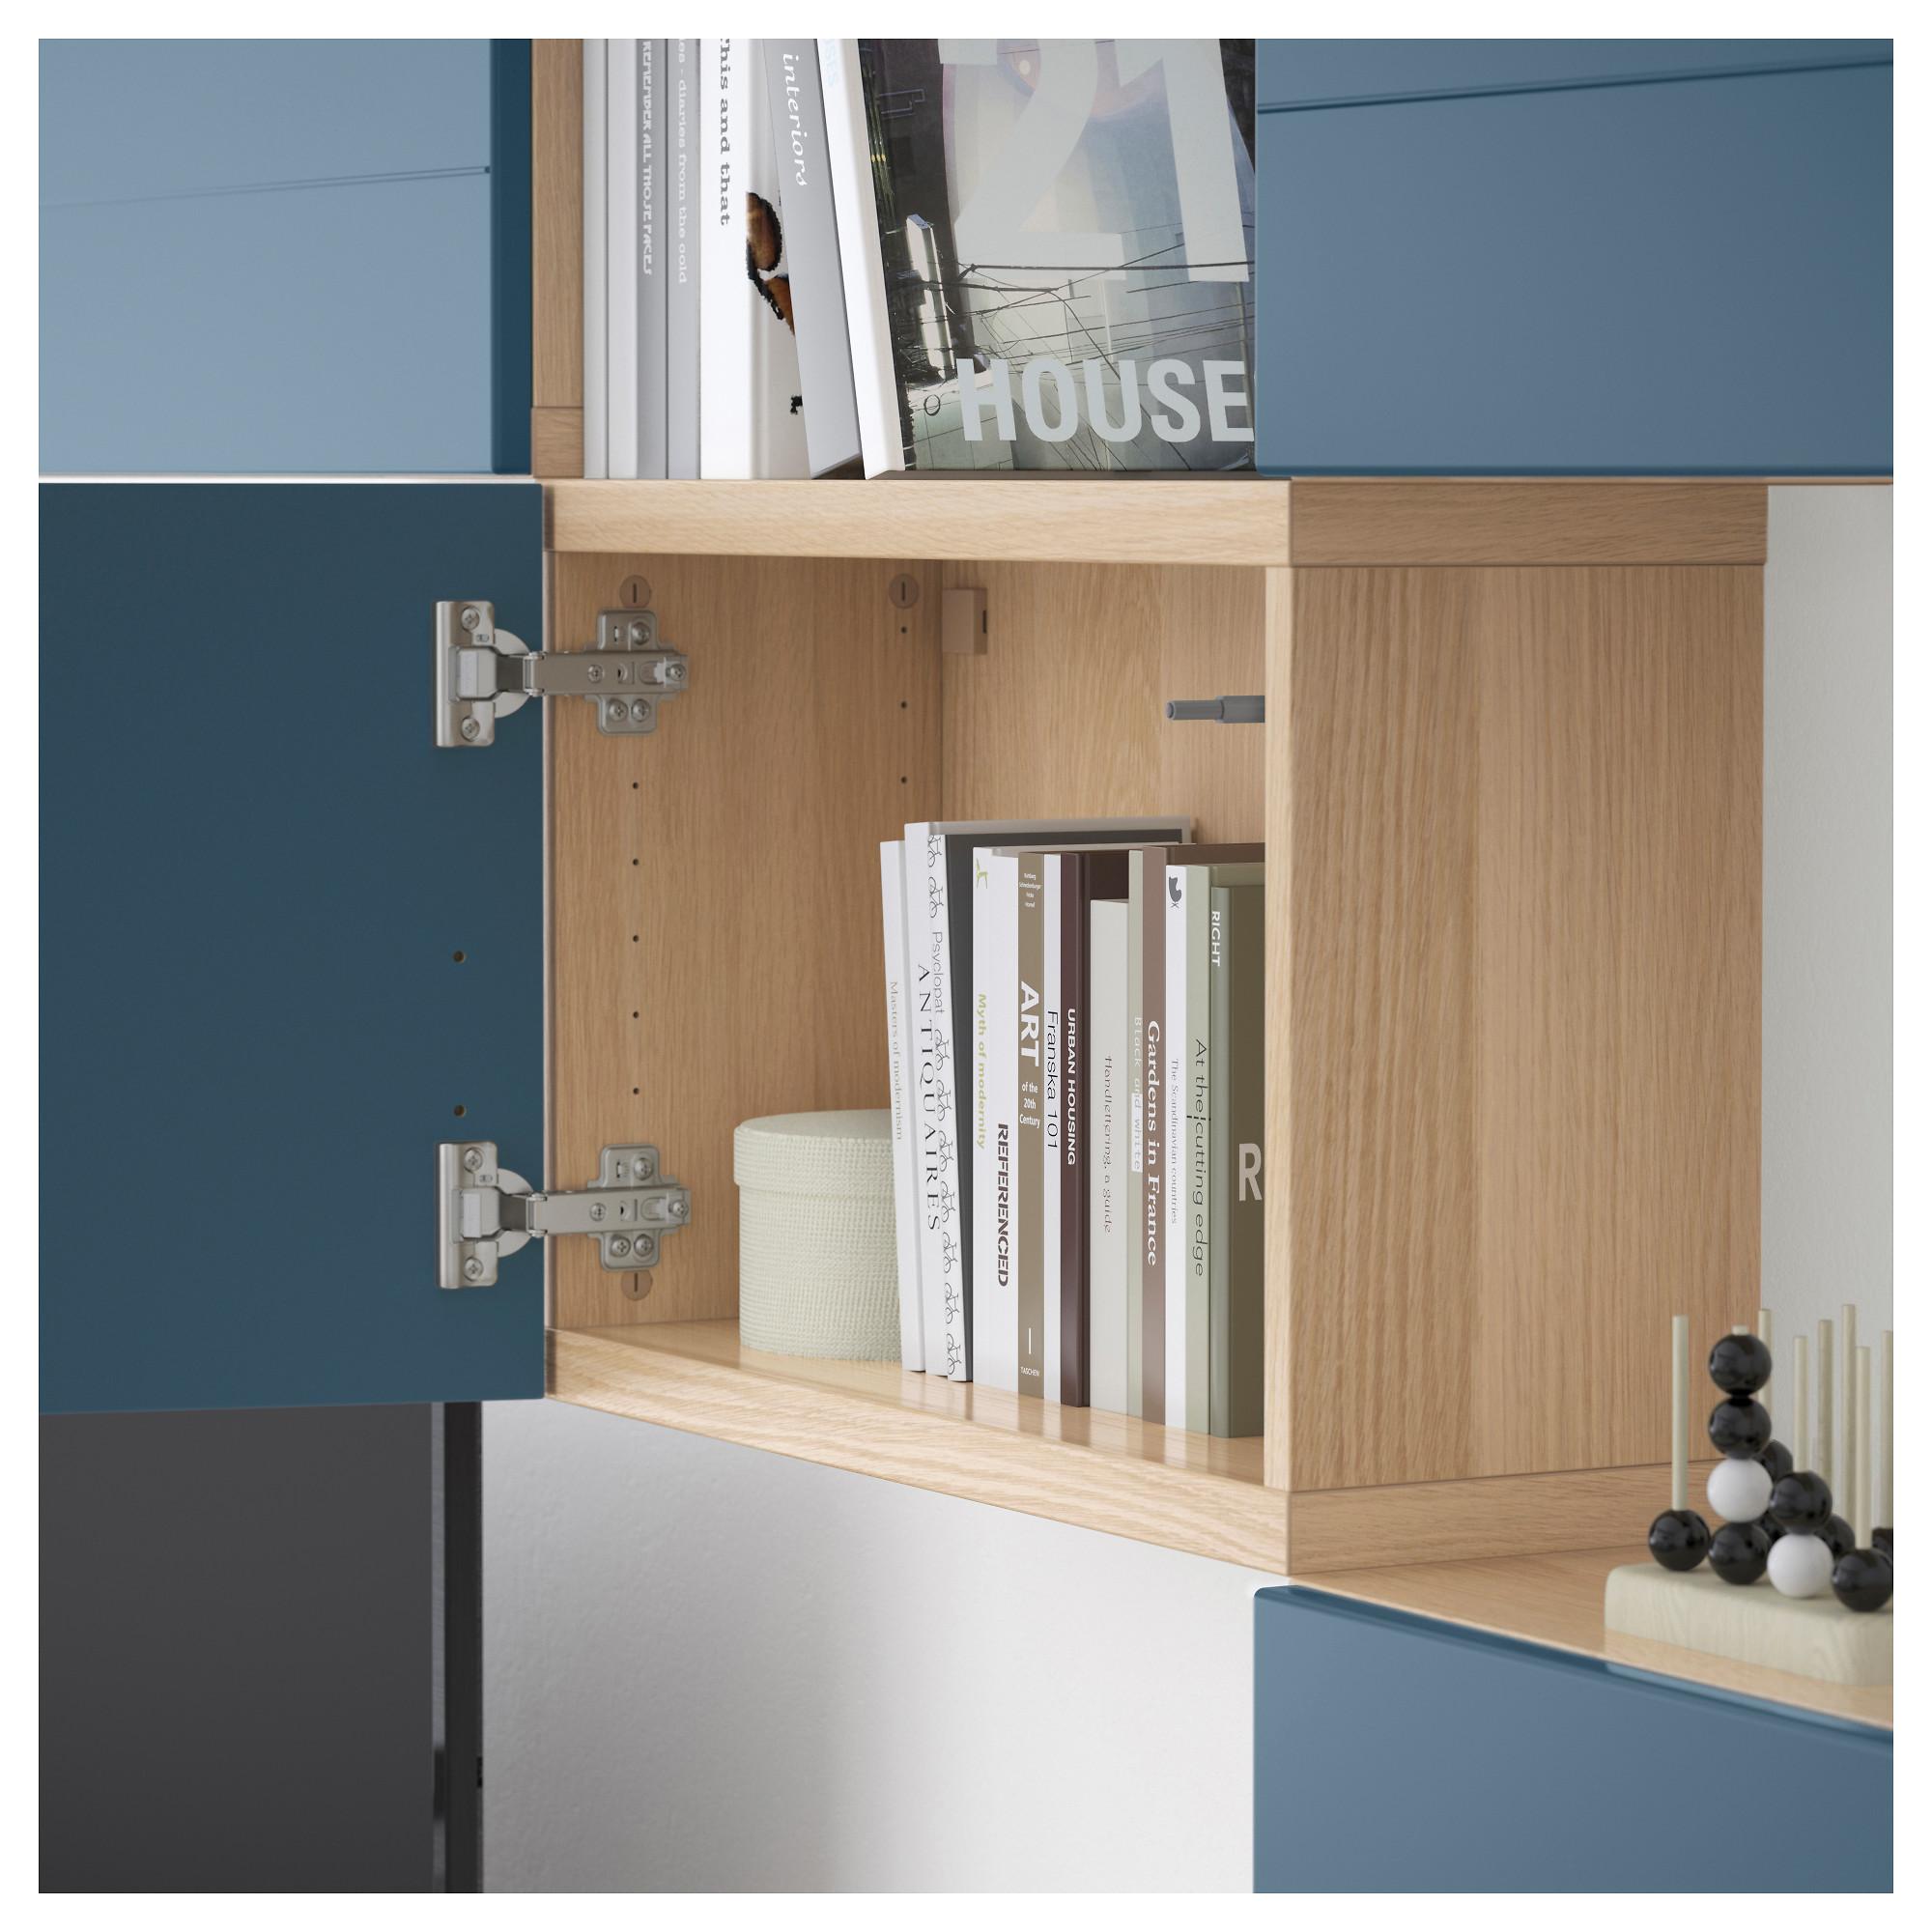 Шкаф для ТВ, комбинация БЕСТО темно-синий артикуль № 592.761.29 в наличии. Онлайн каталог IKEA Беларусь. Быстрая доставка и установка.